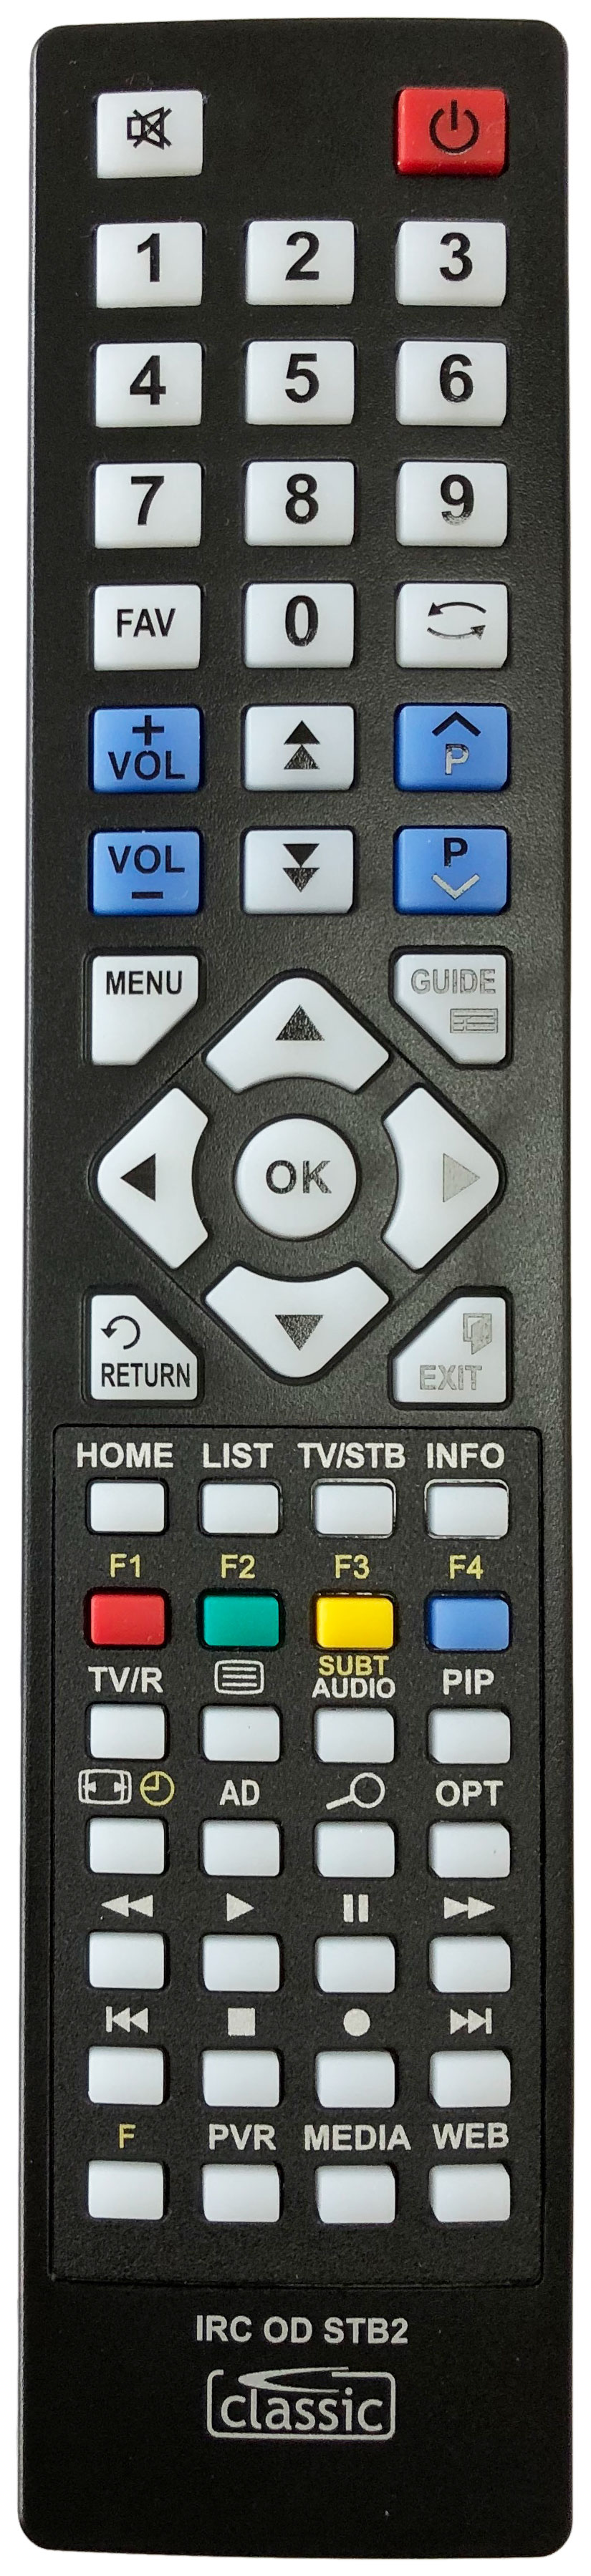 TVONICS MDR252 Remote control